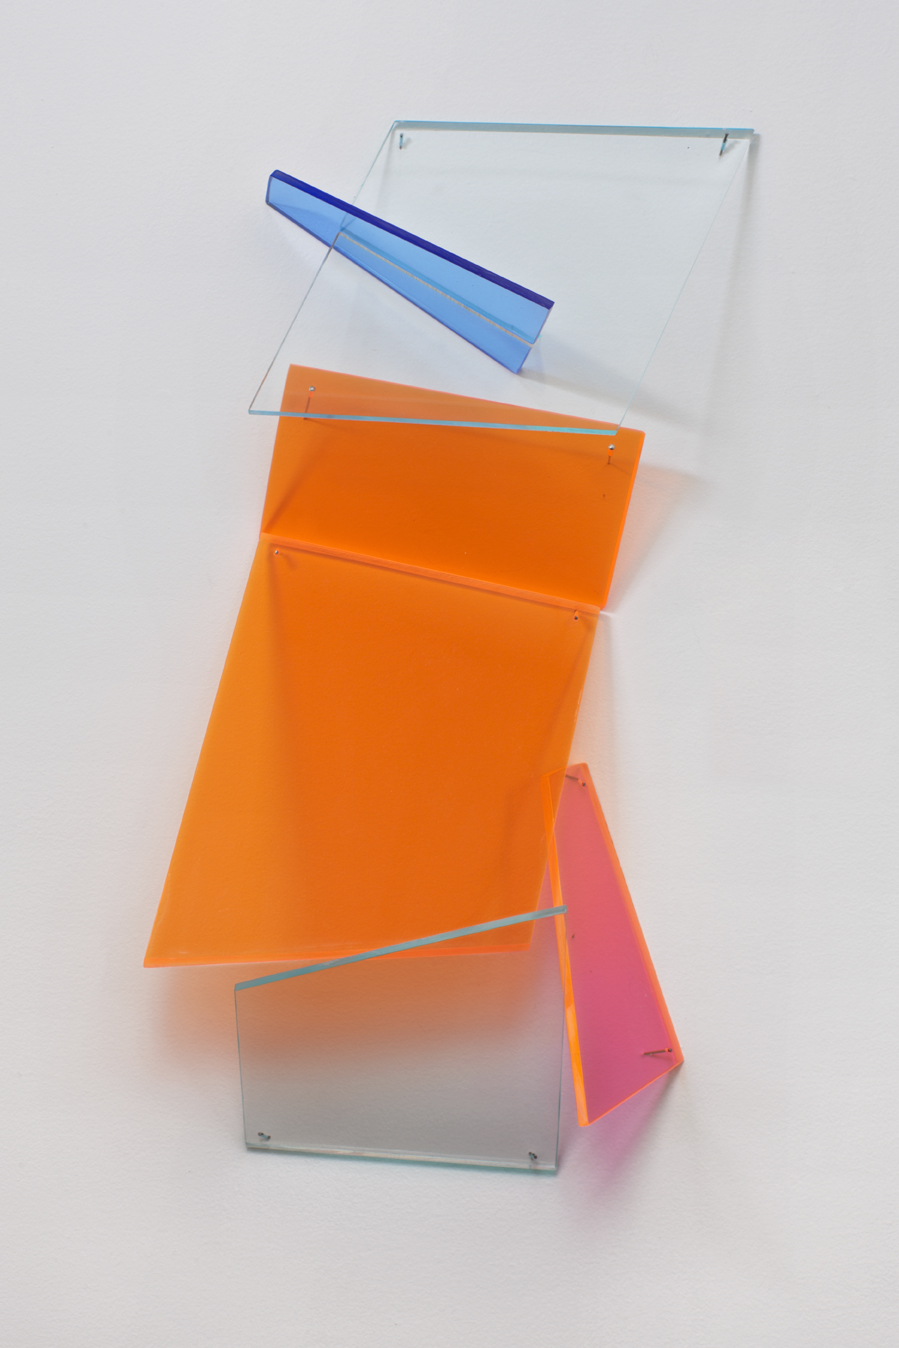 Lyric  2012 Plexiglas 30.5Hx11Wx4D inches / 77x28x33 cm